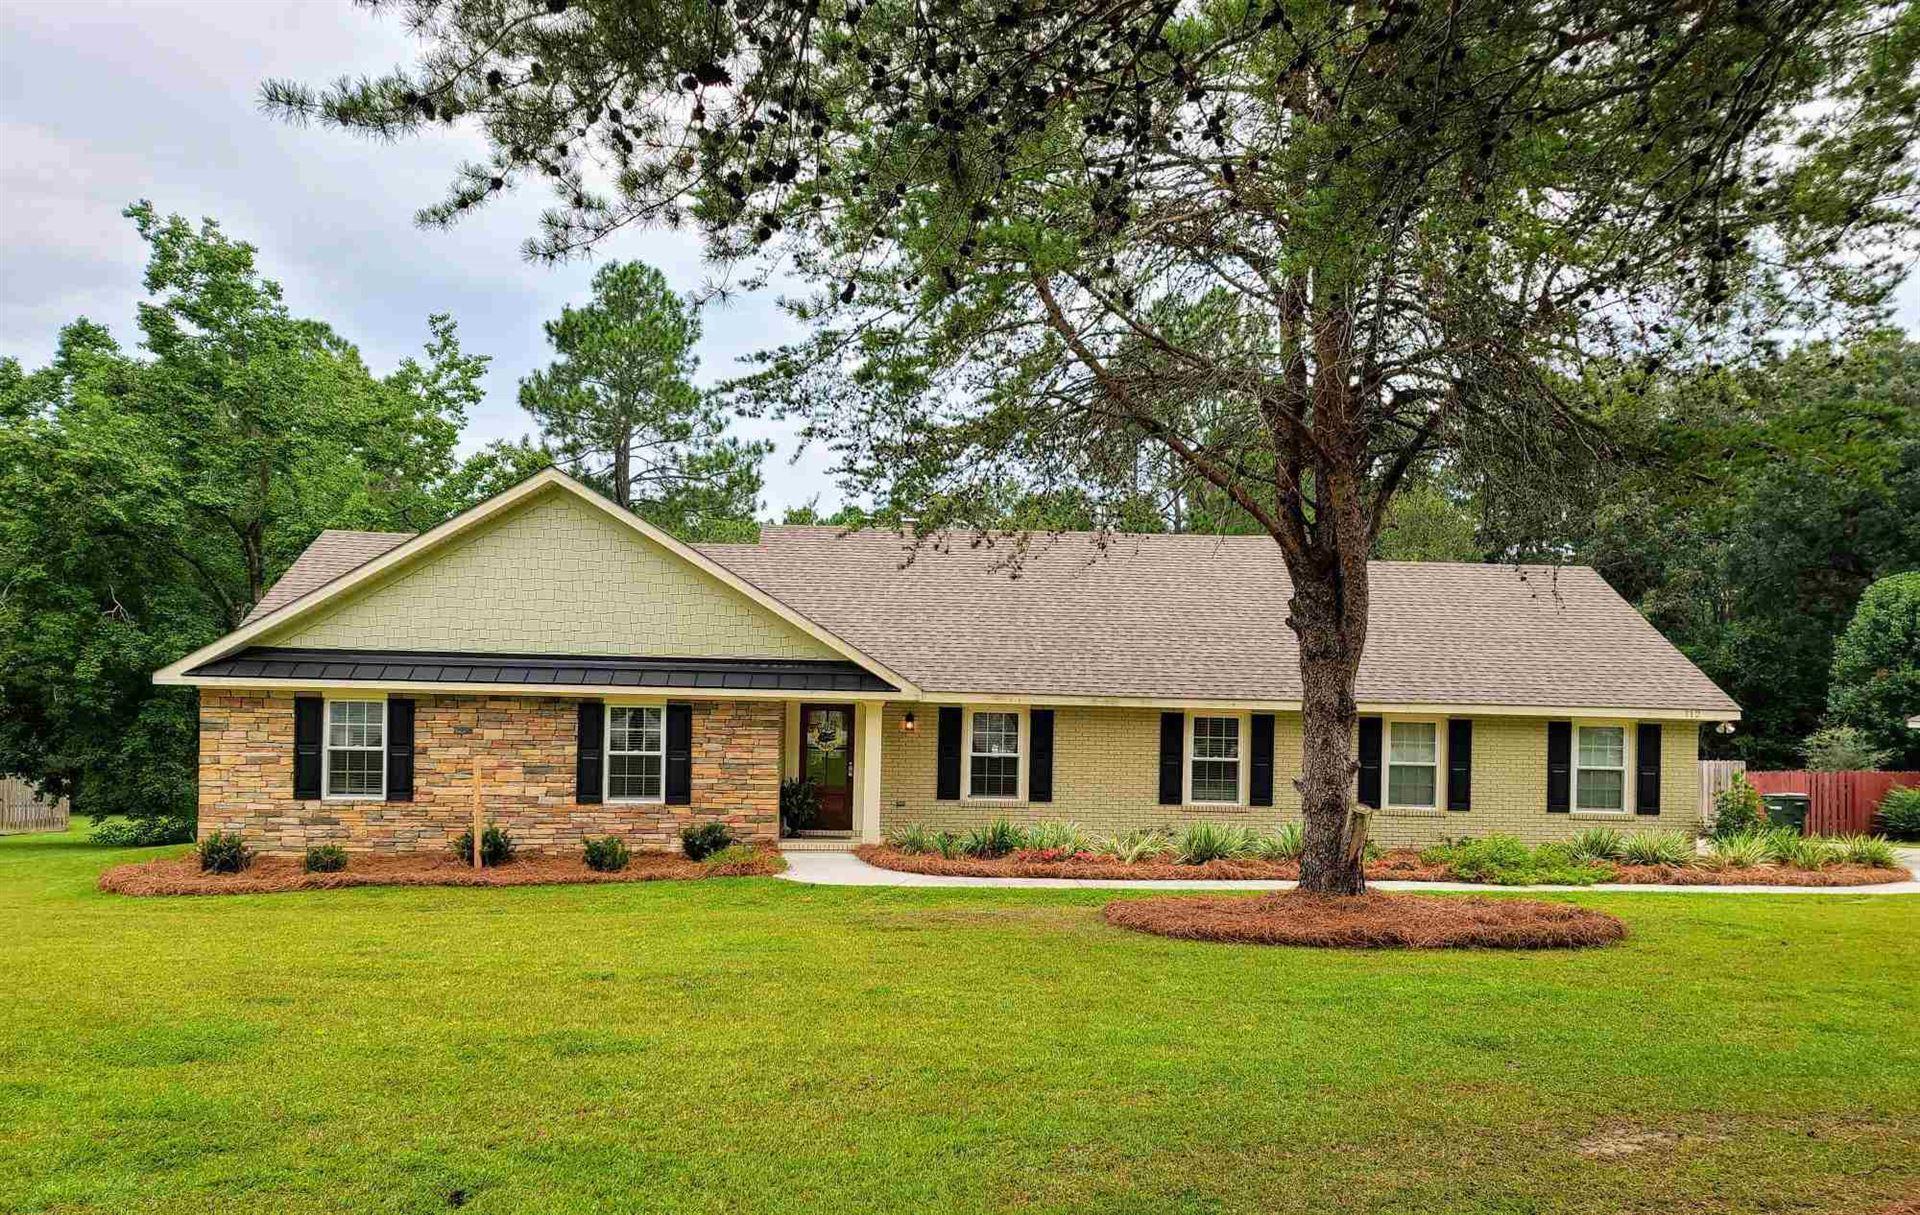 112 Pine Bluff Dr, Statesboro, GA 30458 - #: 8864712